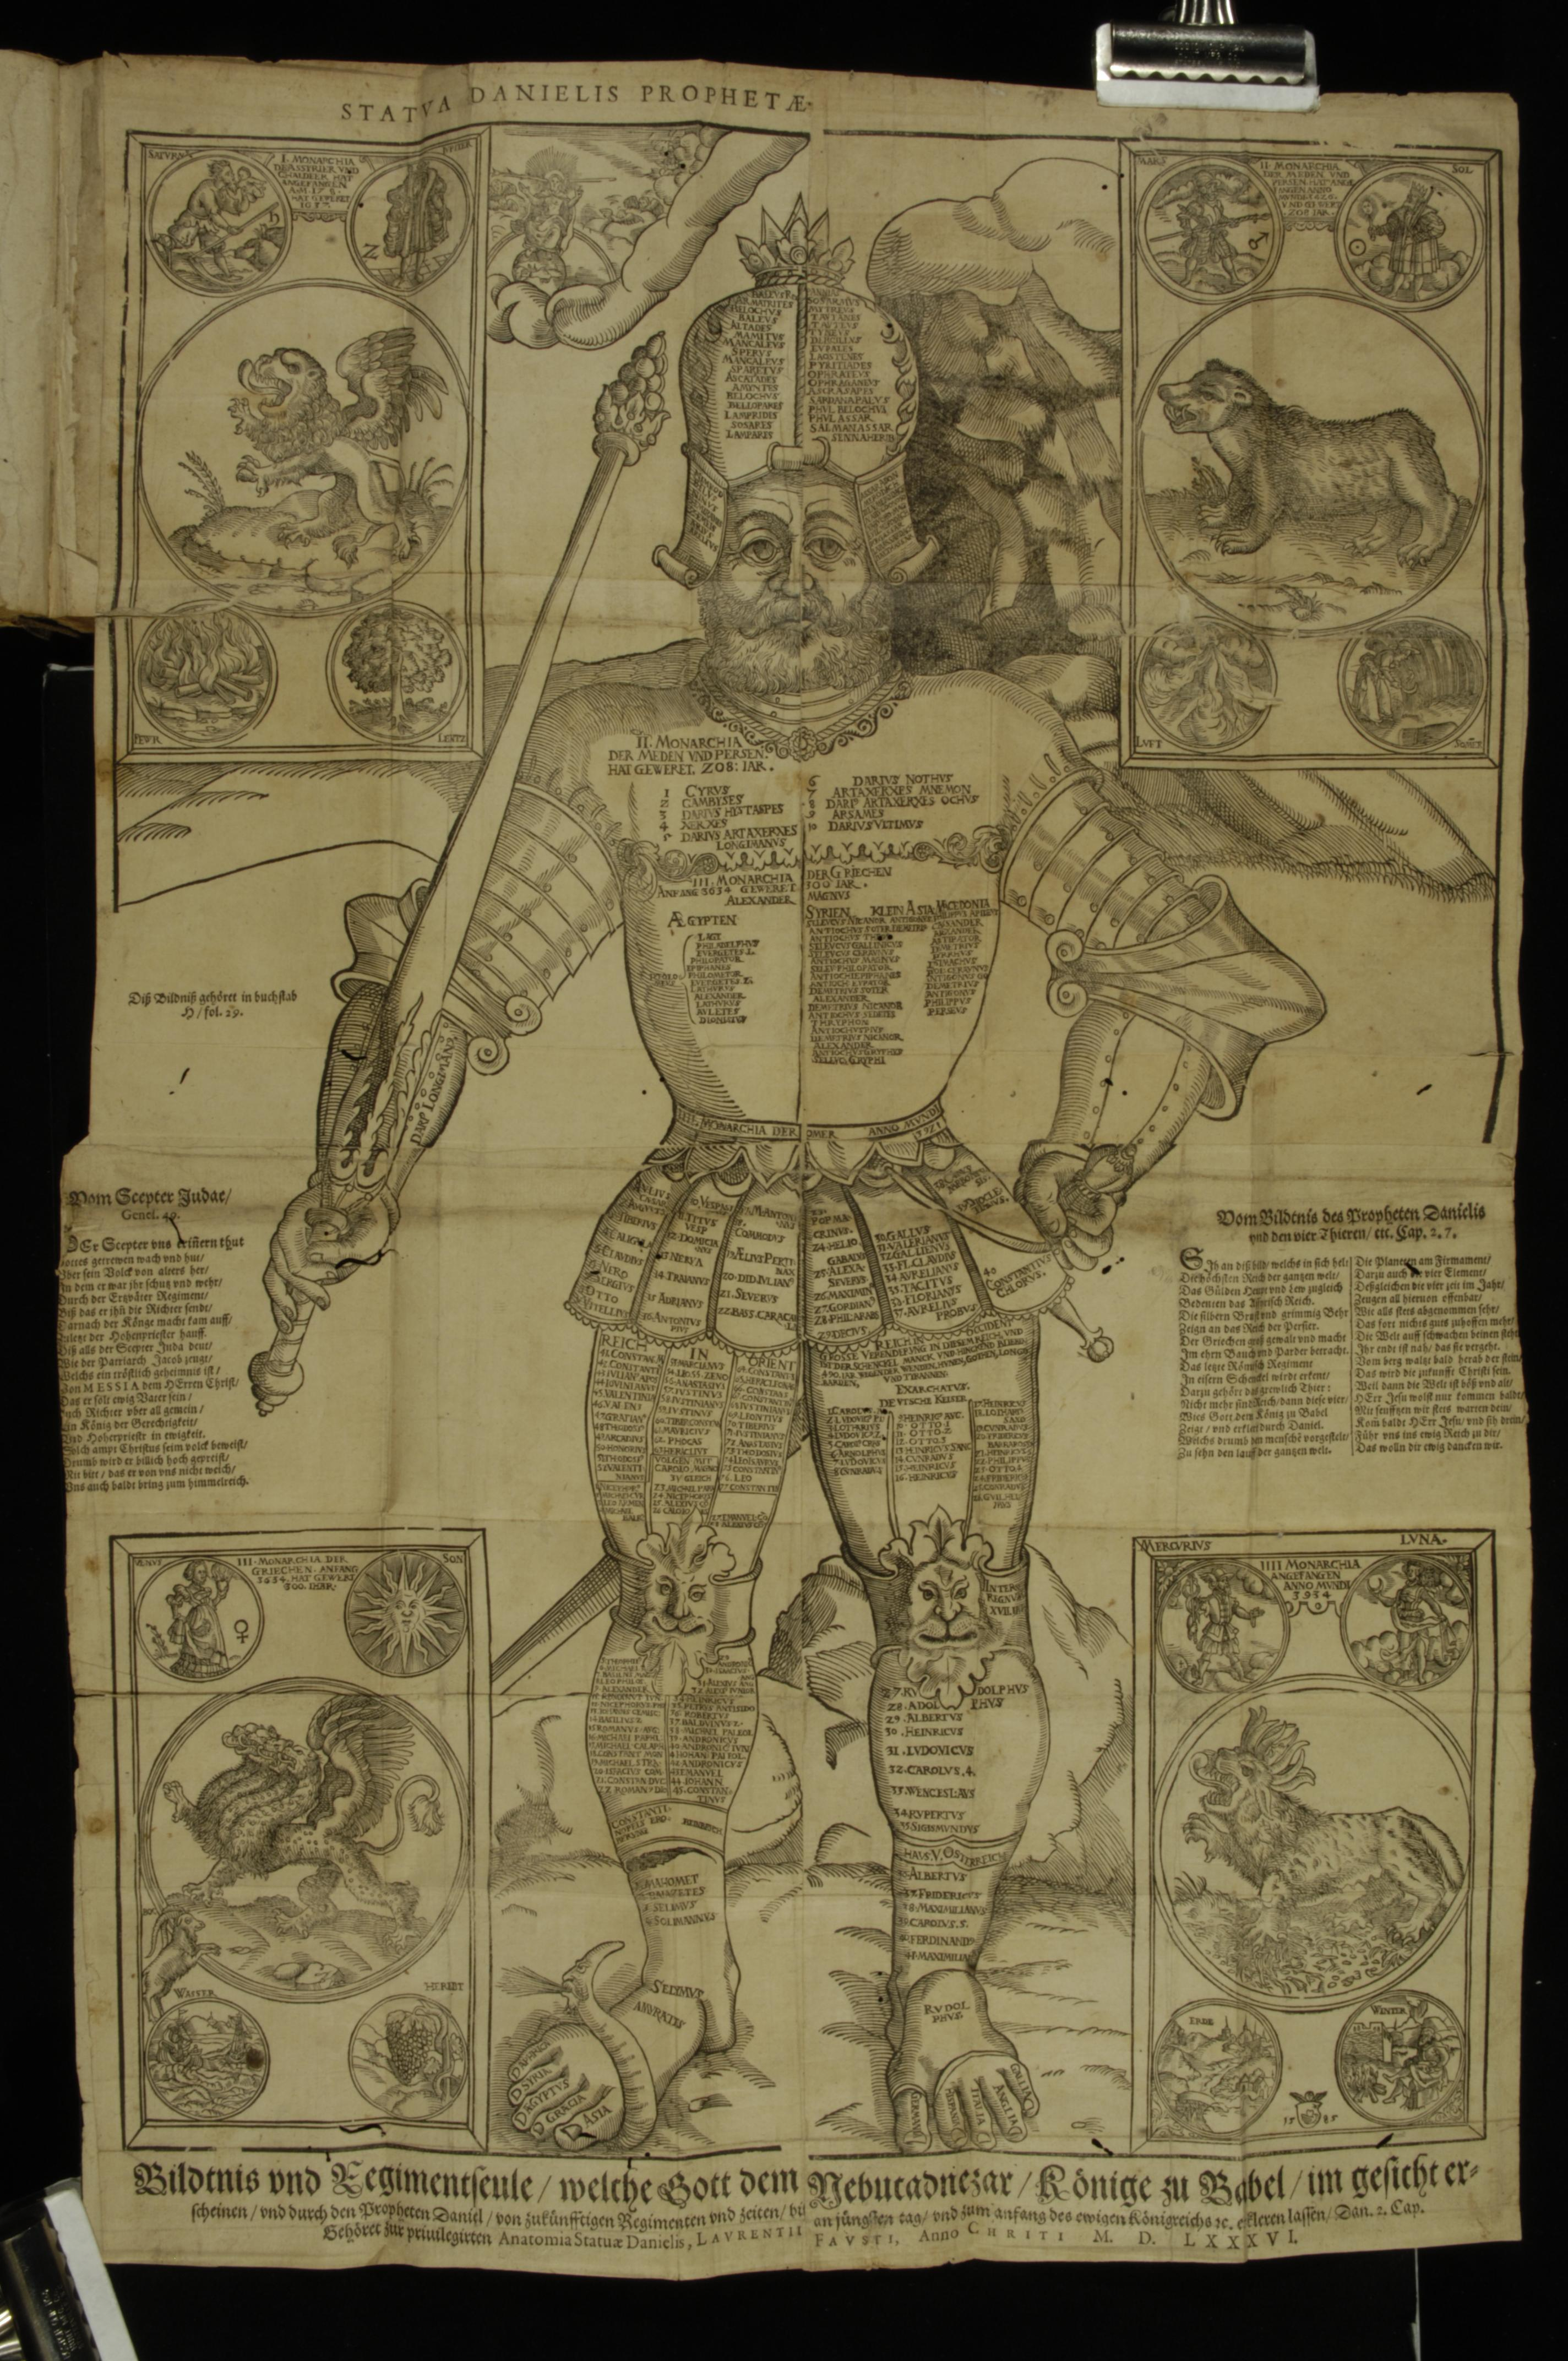 http://blogs.princeton.edu/rarebooks/images/1586_Anatomia_Statuae_Danielis.jpg